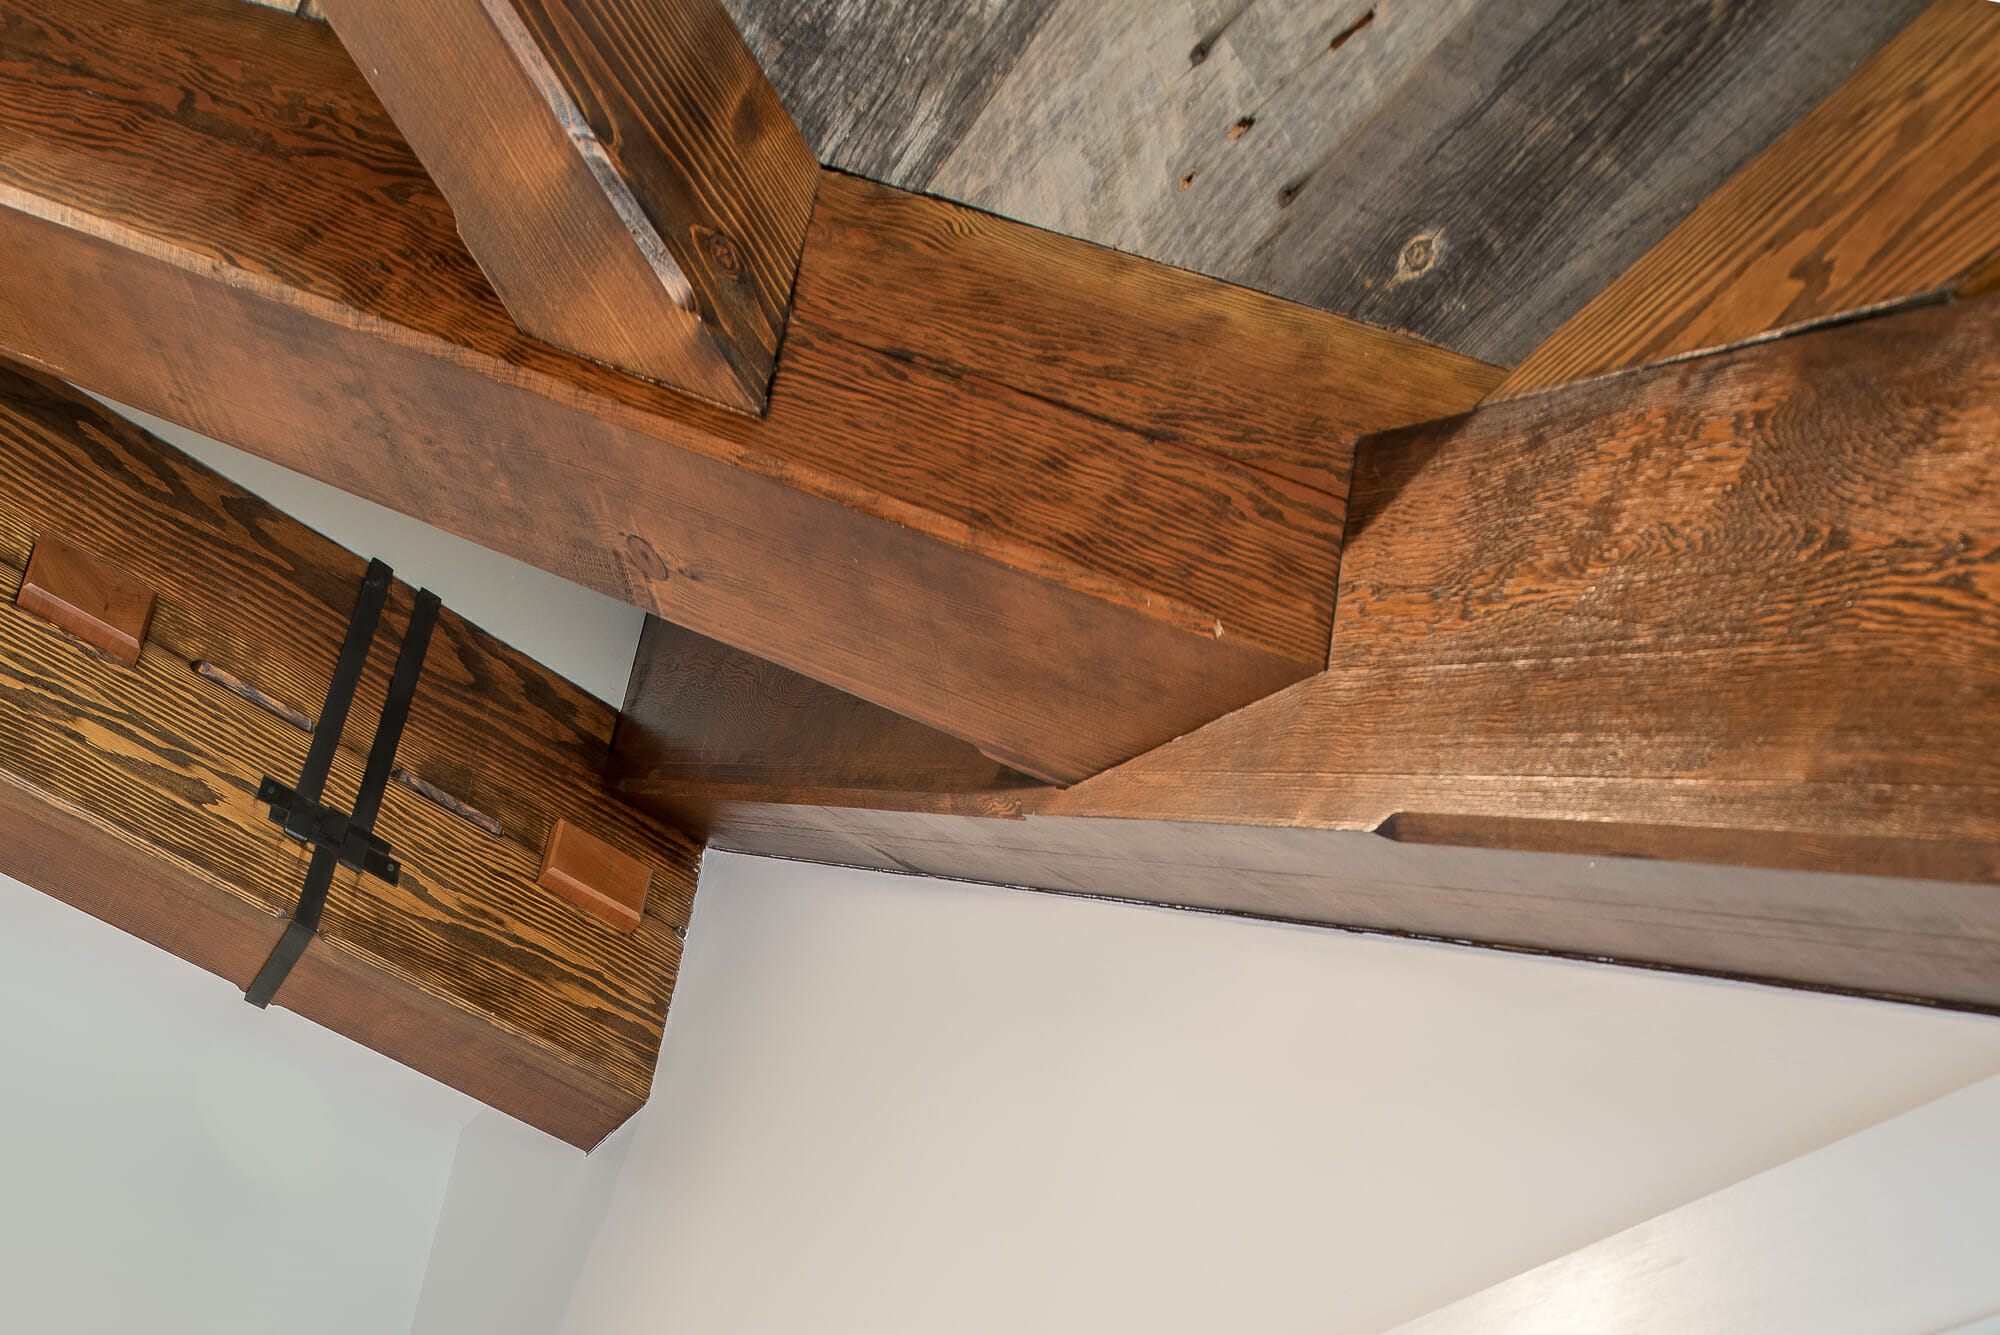 Barn Home With A Douglas Fir Timber Frame